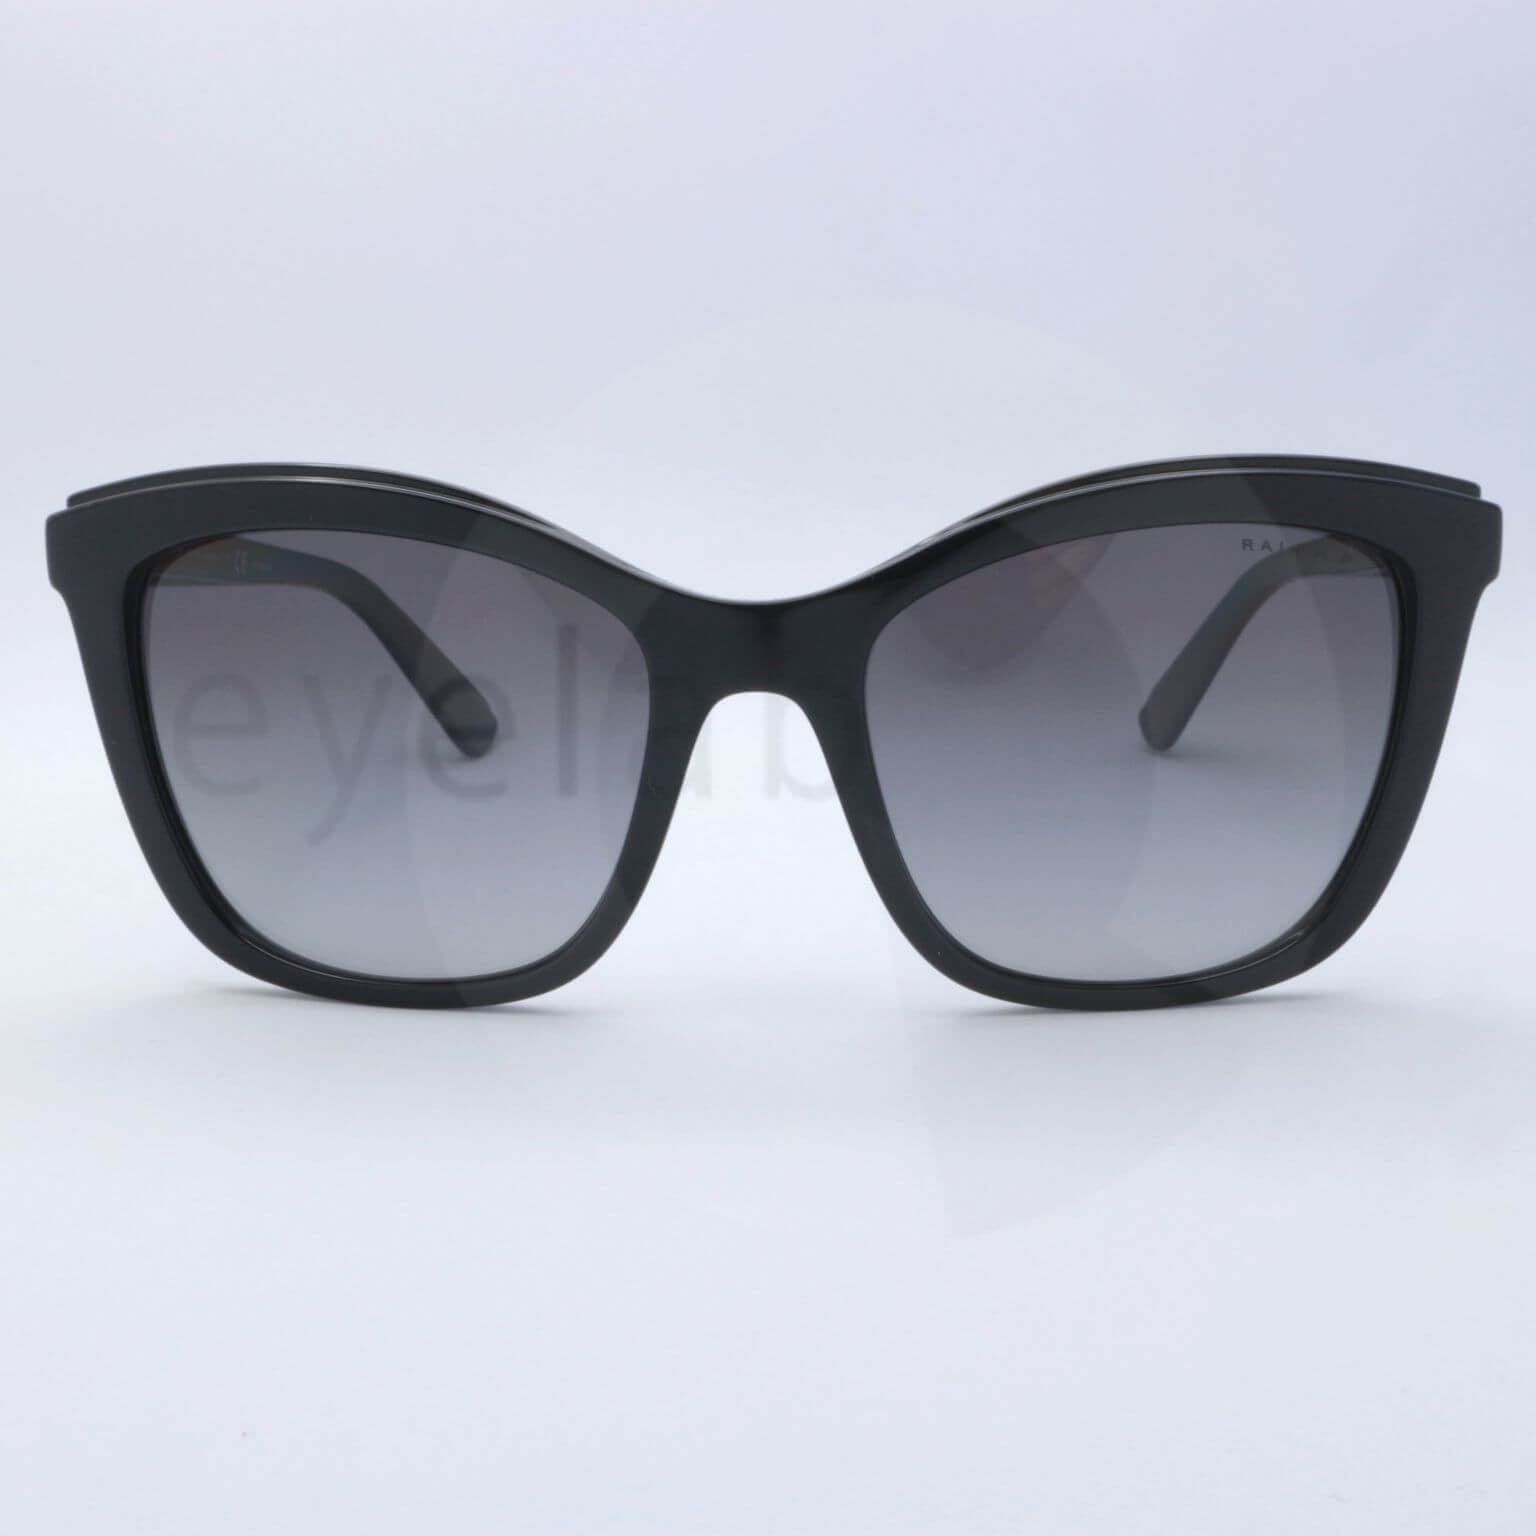 f1453042c3 Γυαλιά ηλίου Ralph by Ralph Lauren 5252 5001T3 ~ Eyelab